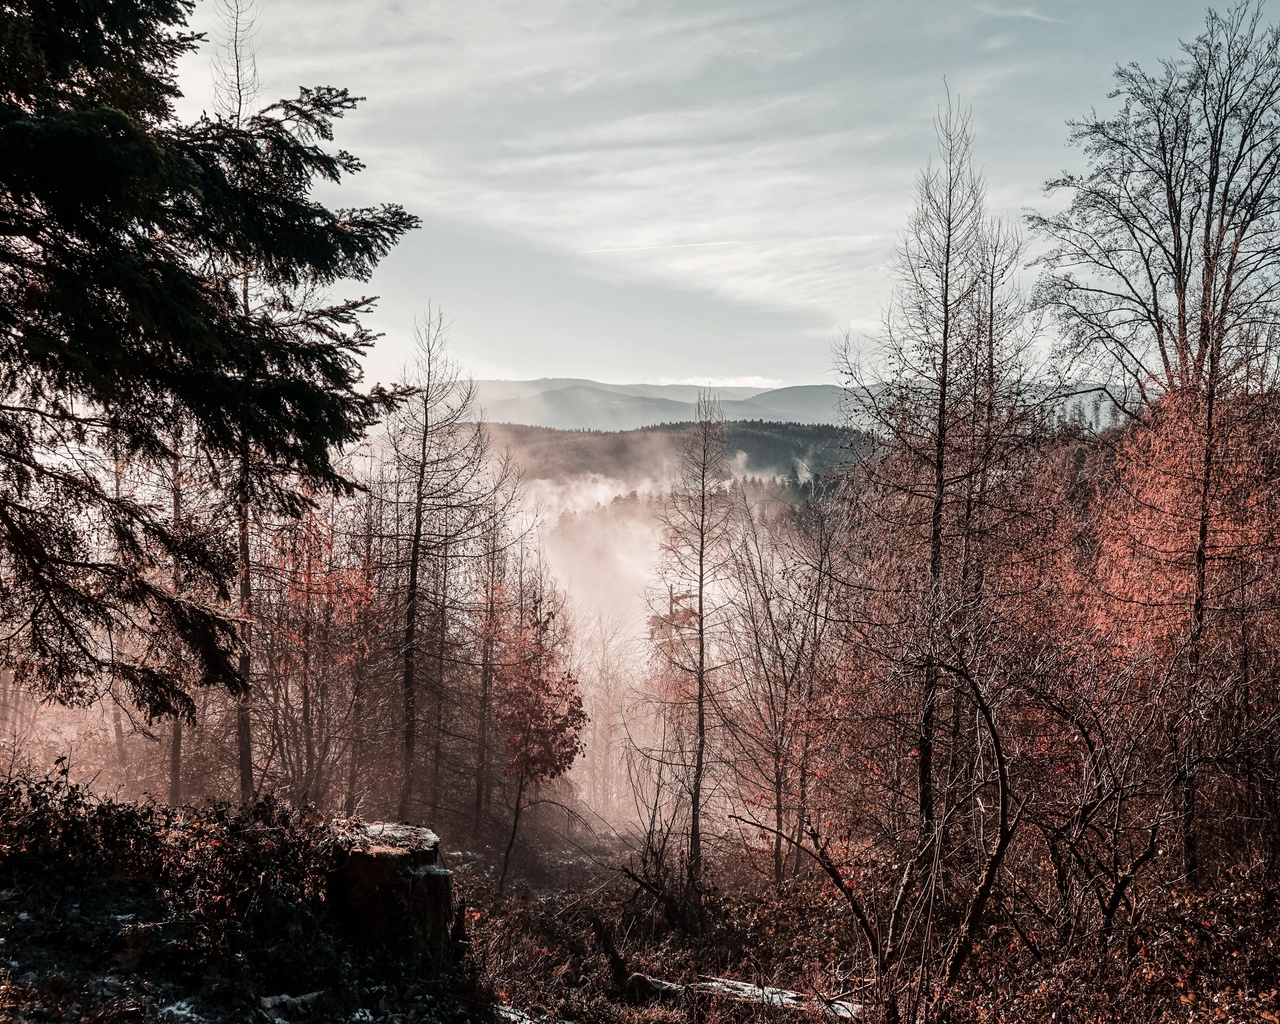 природа, деревья, туман